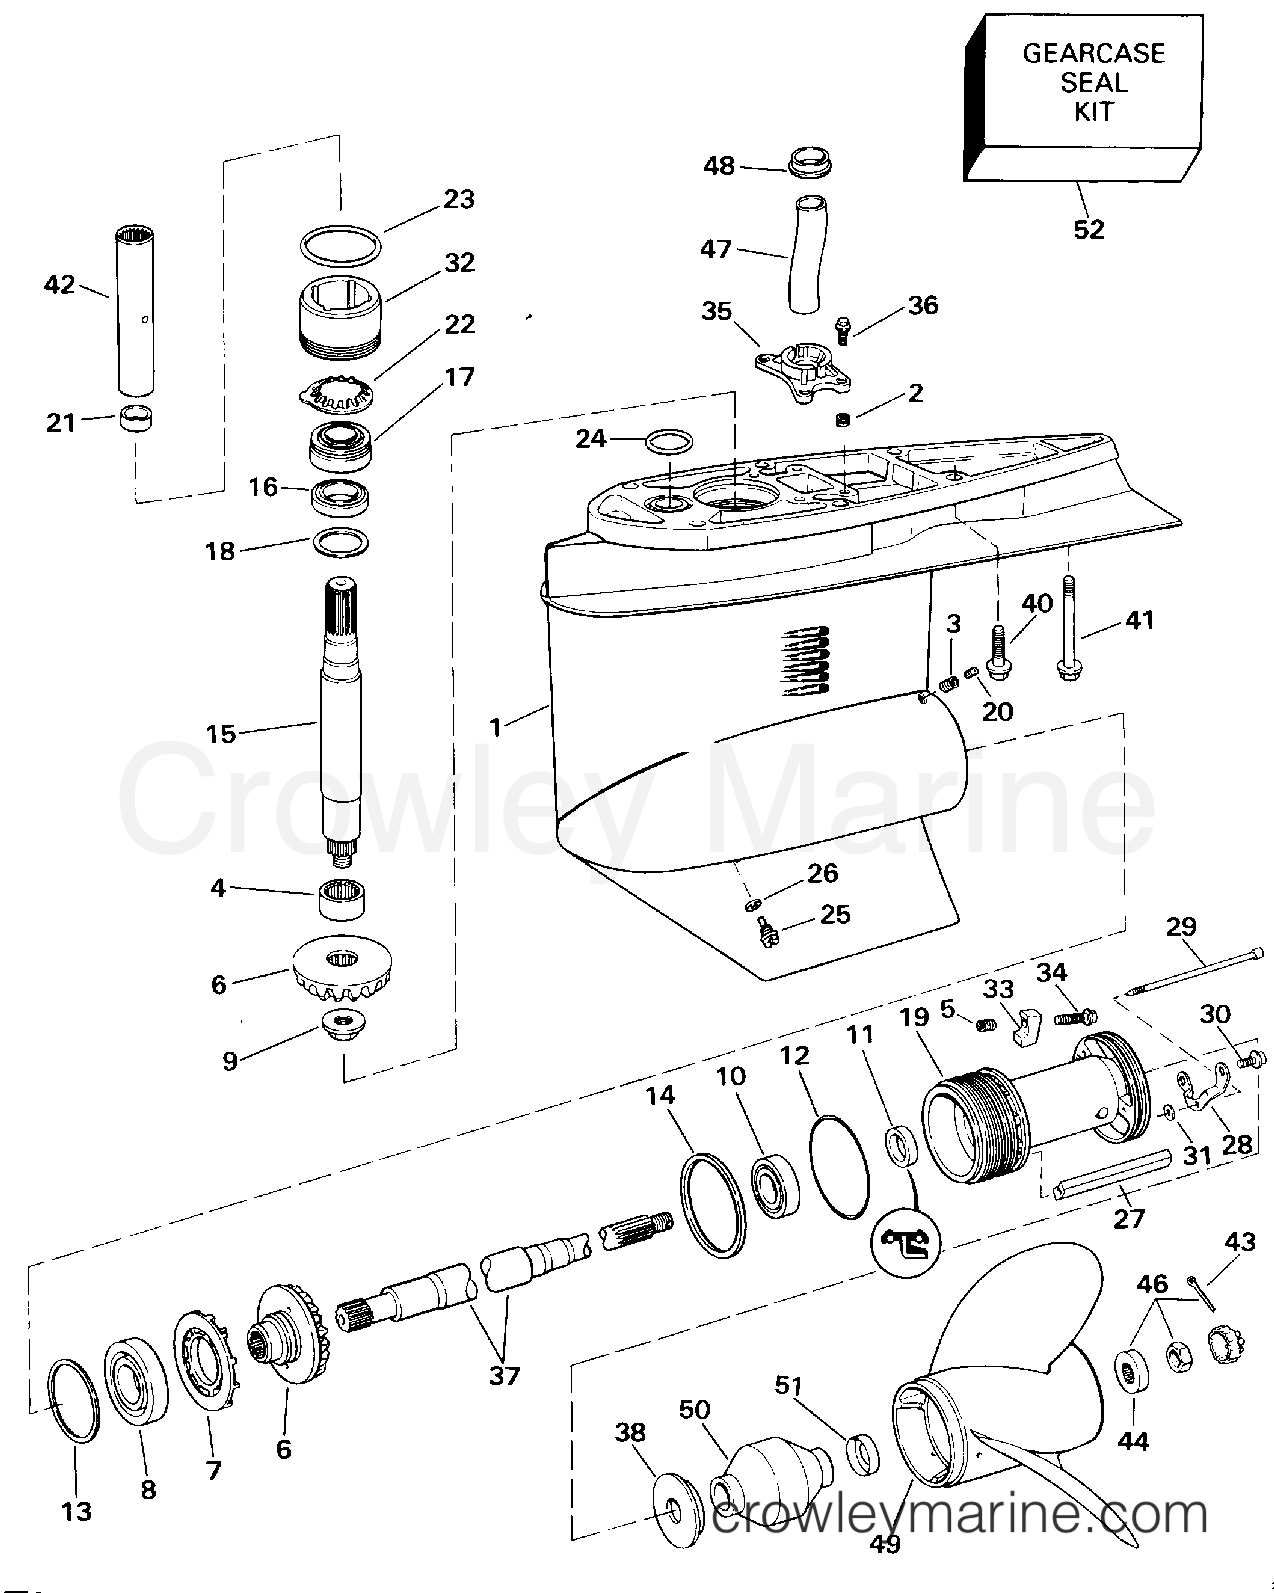 1994 OMC Stern Drive 7.4 - 744DJPMDA - LOWER GEARCASE